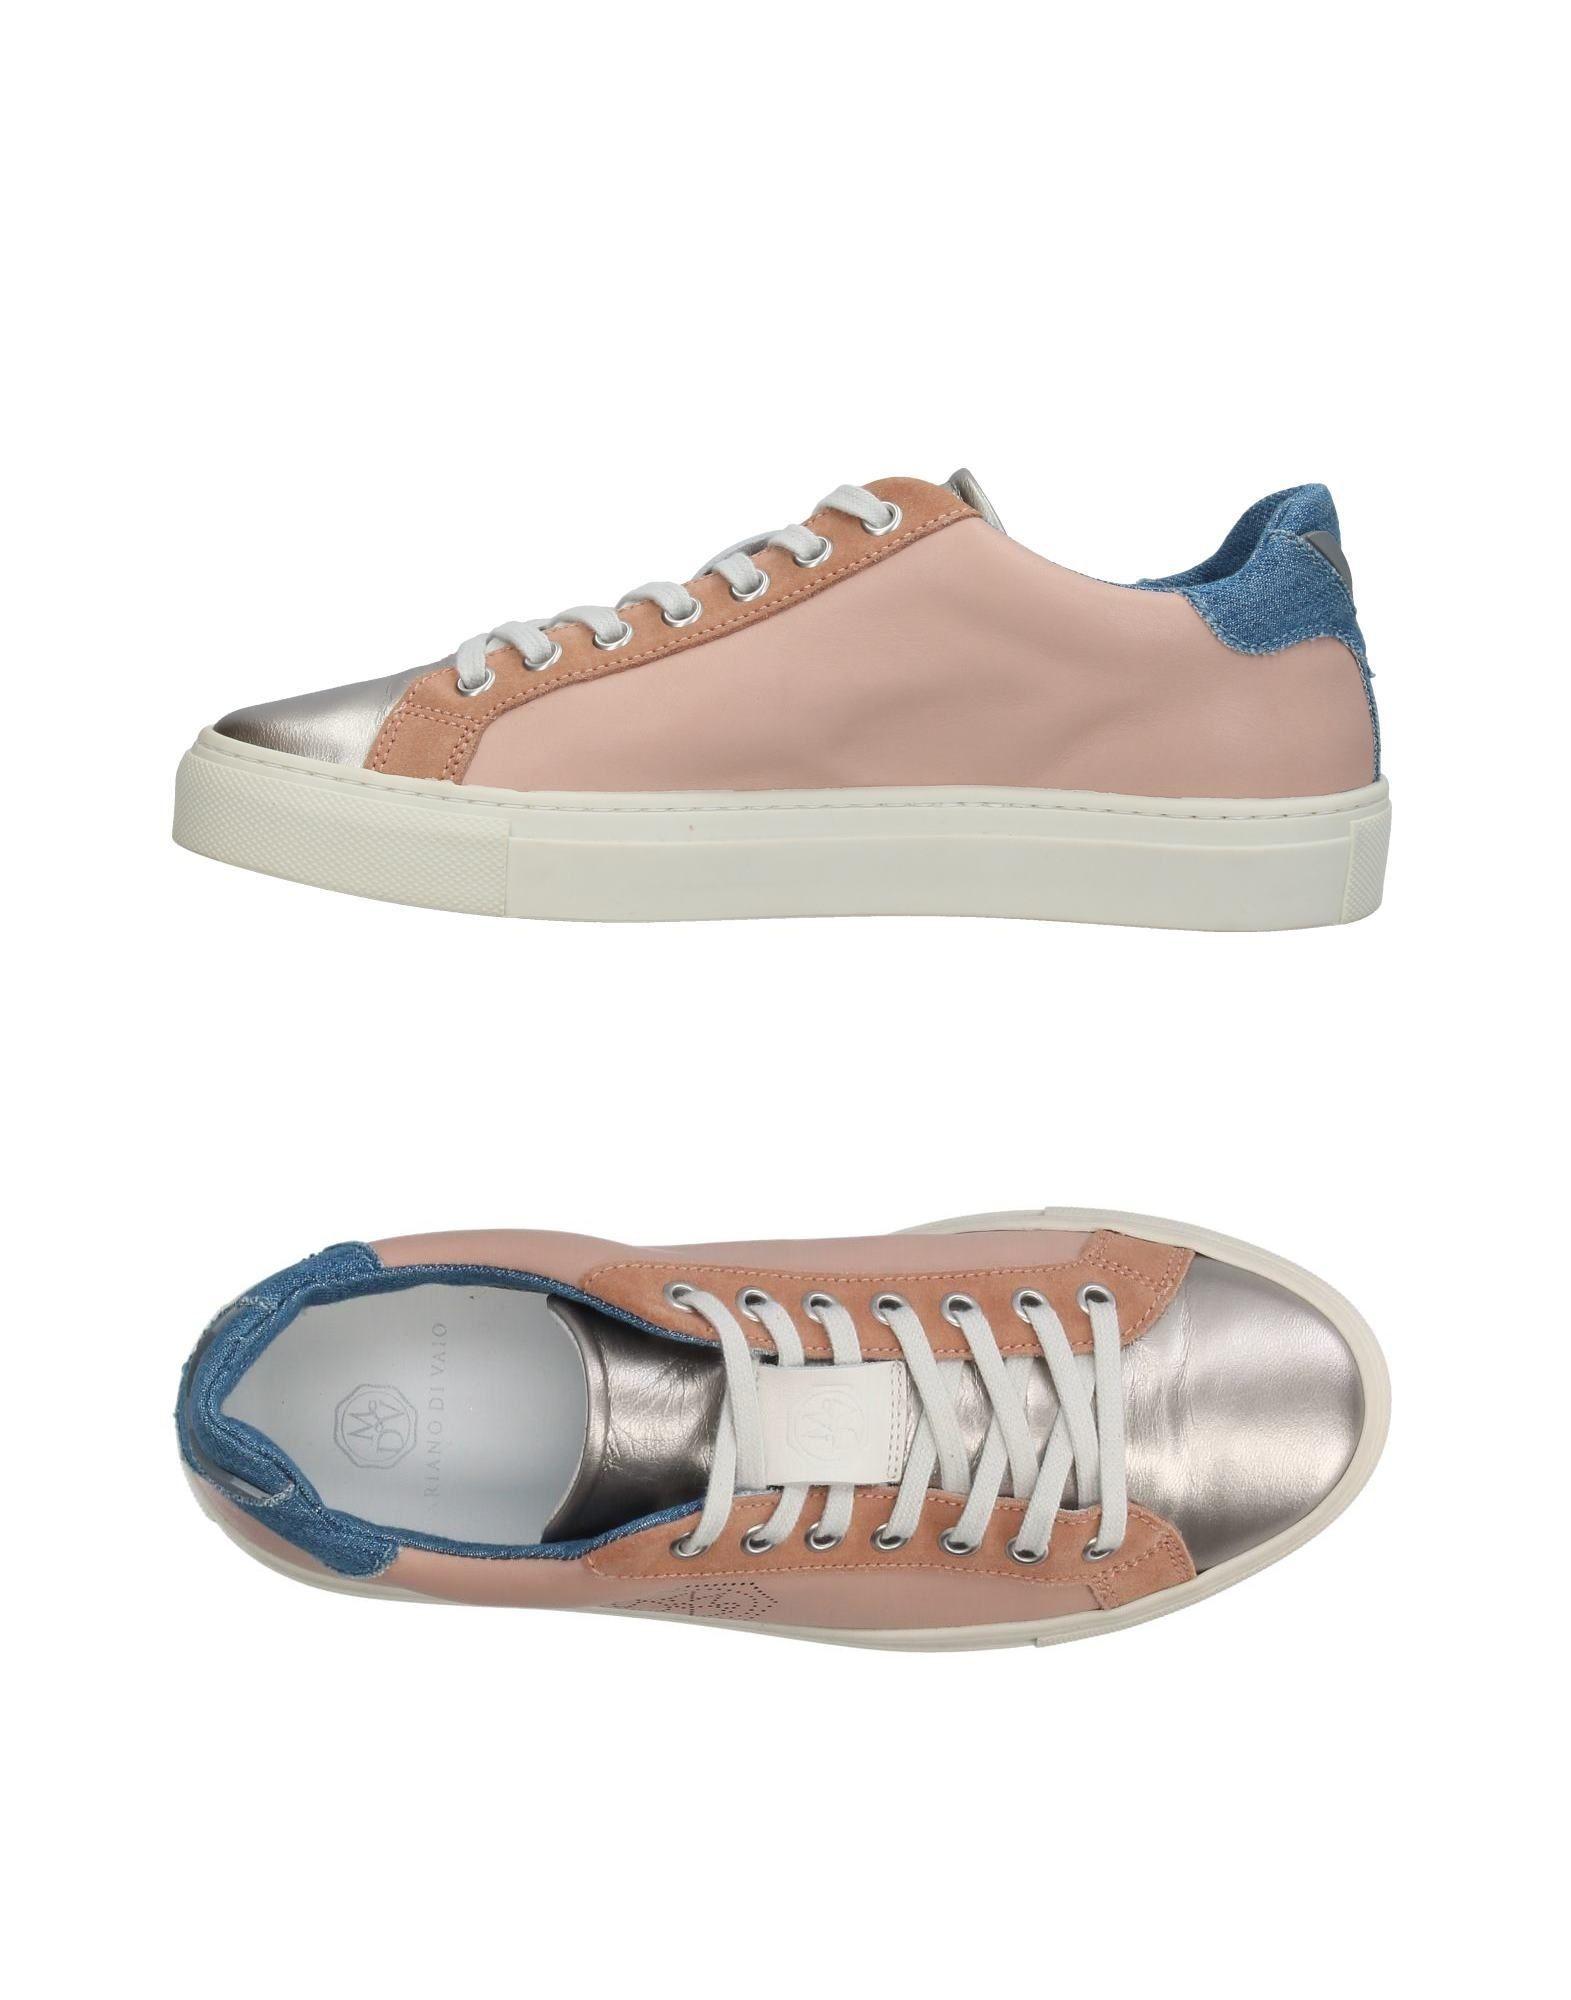 Mariano Di Vaio Sneakers Damen  11378536ER Gute Qualität beliebte Schuhe